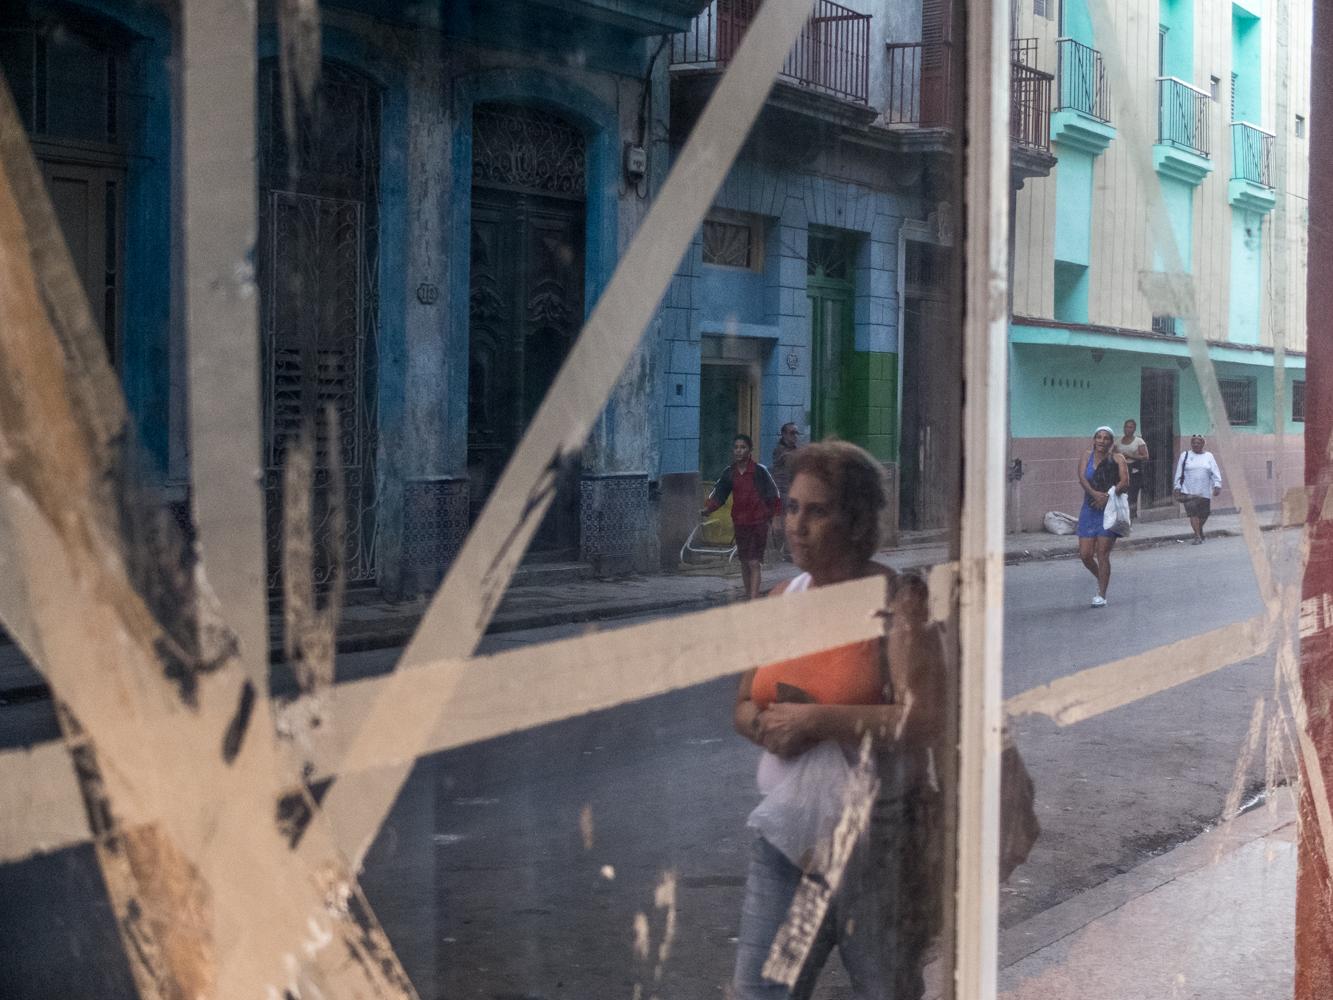 Siempre listo para la próxima tormenta, Fragmented Reflections, © F. Emmanuel Bastien, Manuphotos